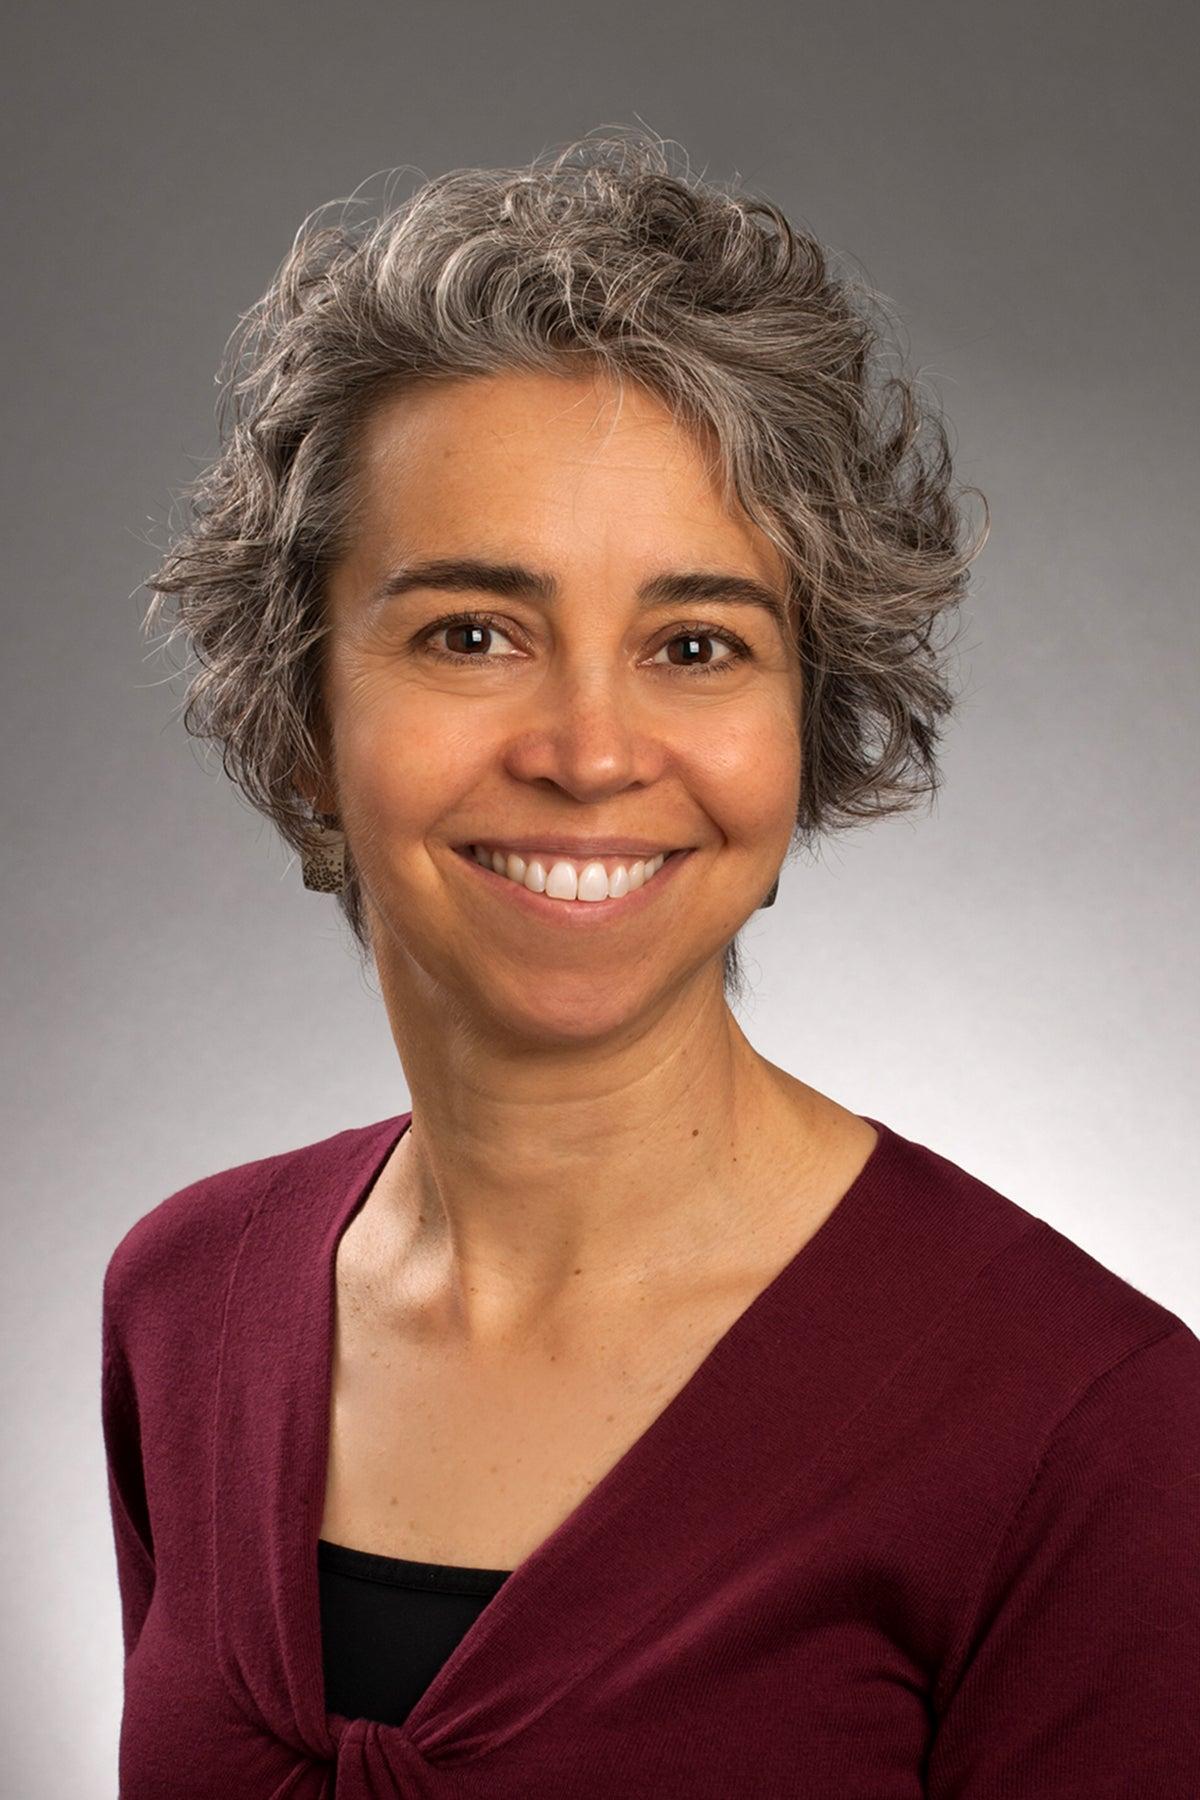 Susan Shadle